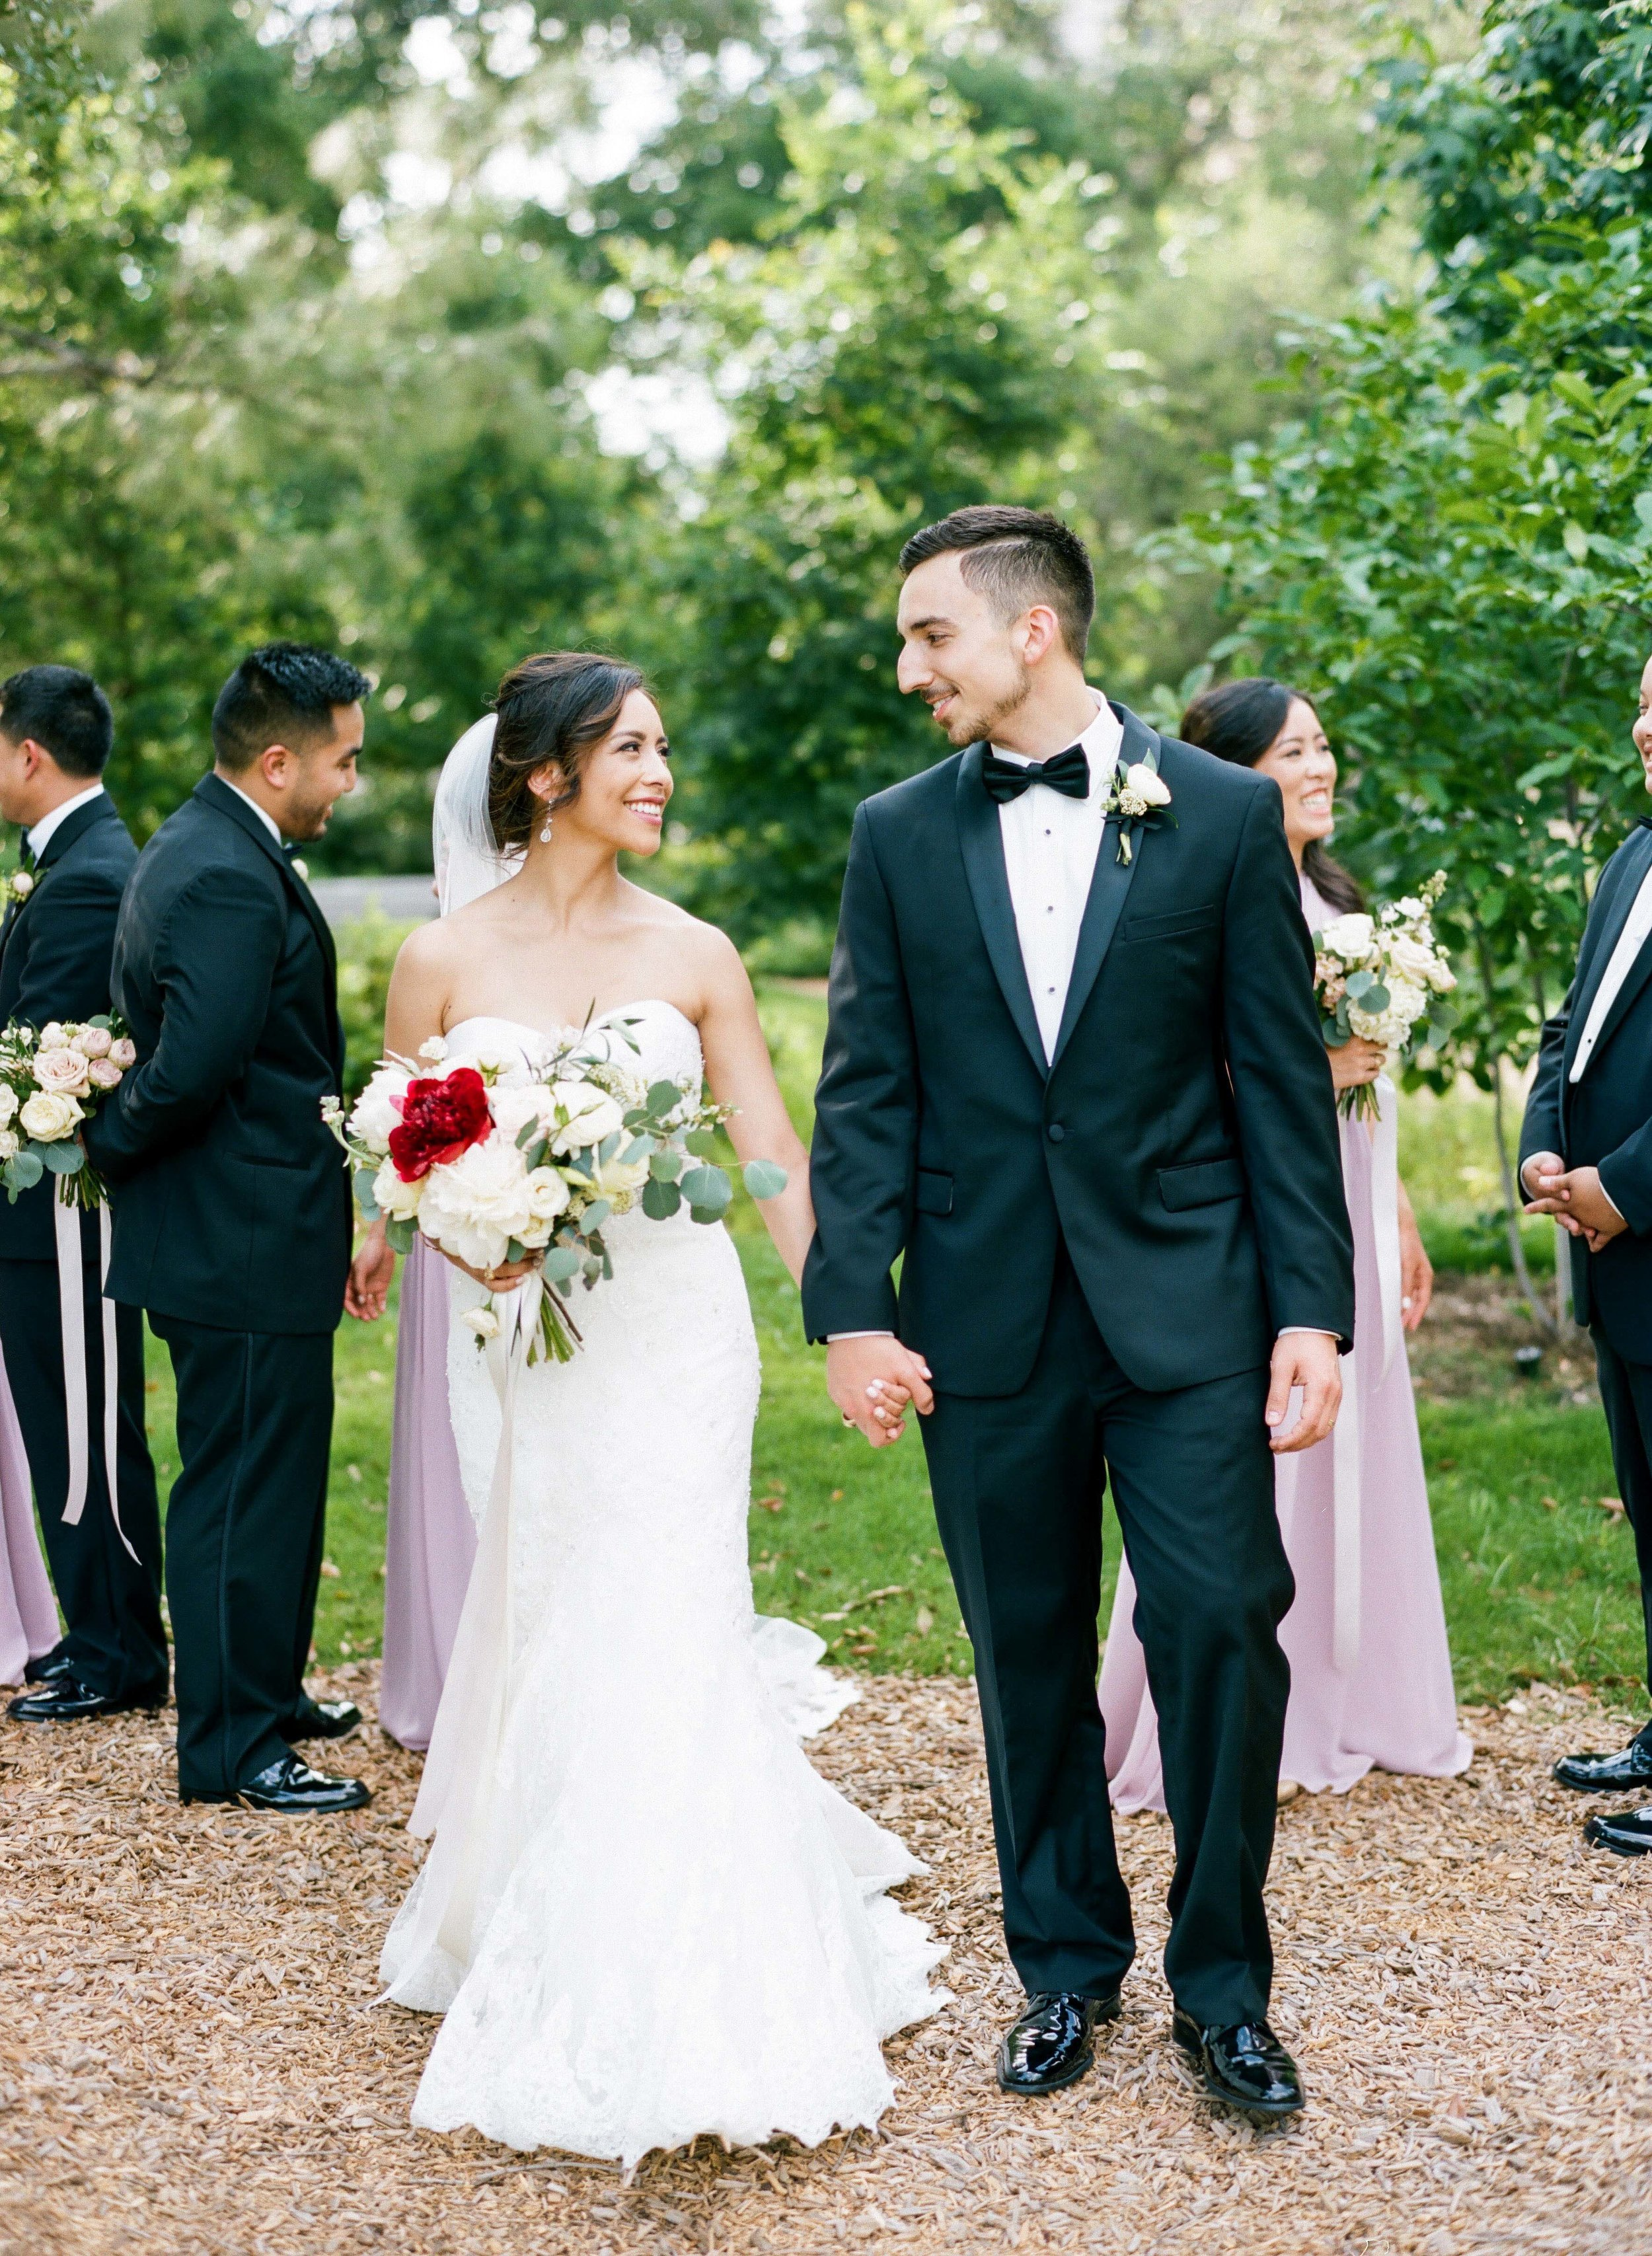 Houston-Wedding-Photography-St.-Anne-Catholic-Church-Houston-Wedding-The-Bell-Tower-on-34th-reception-wedding-film-21.jpg